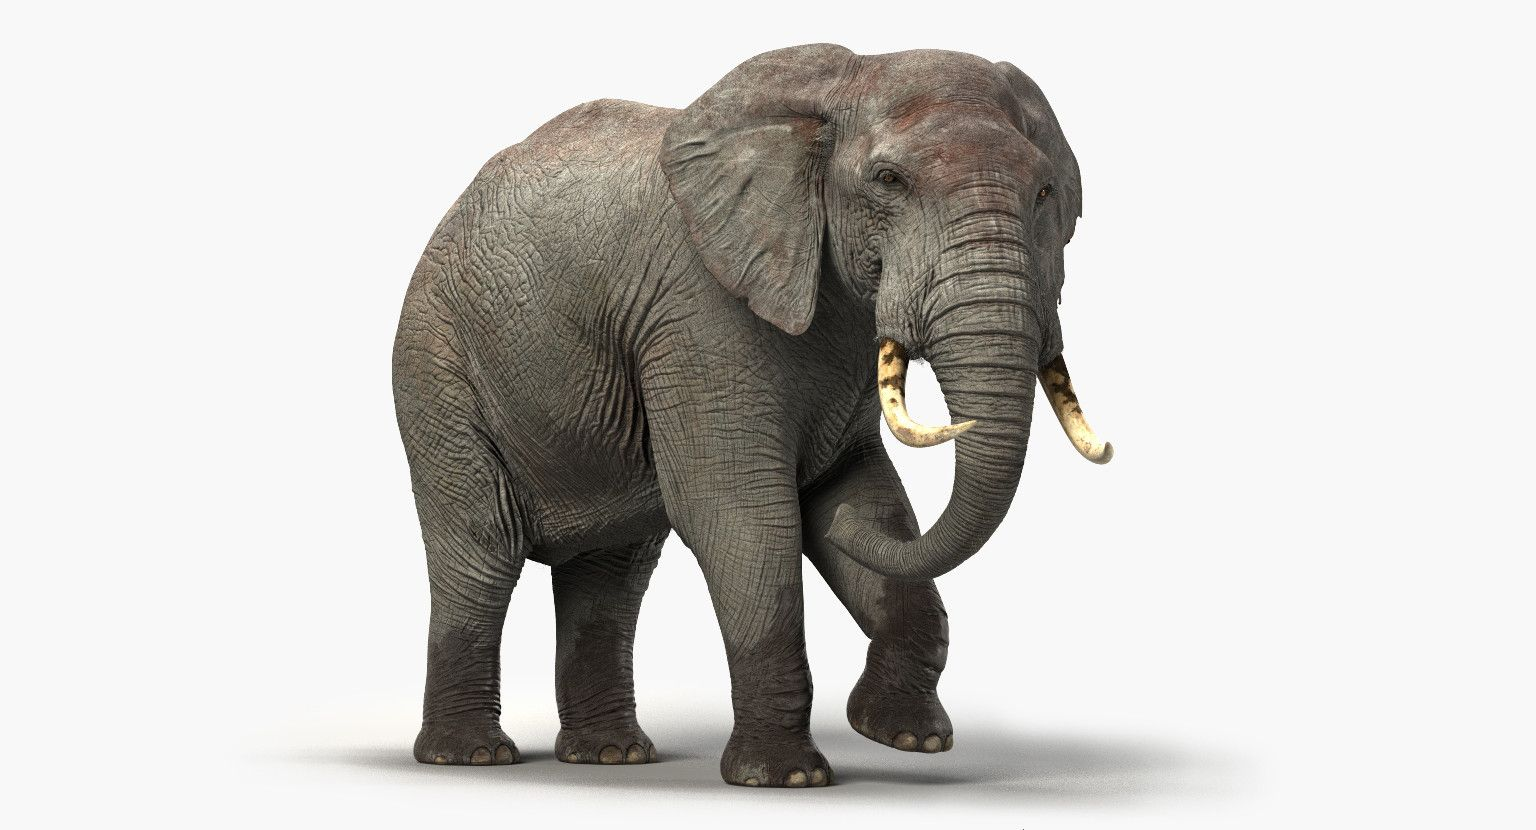 Elephant Rigged 3d Elephant 3d Model Rigs